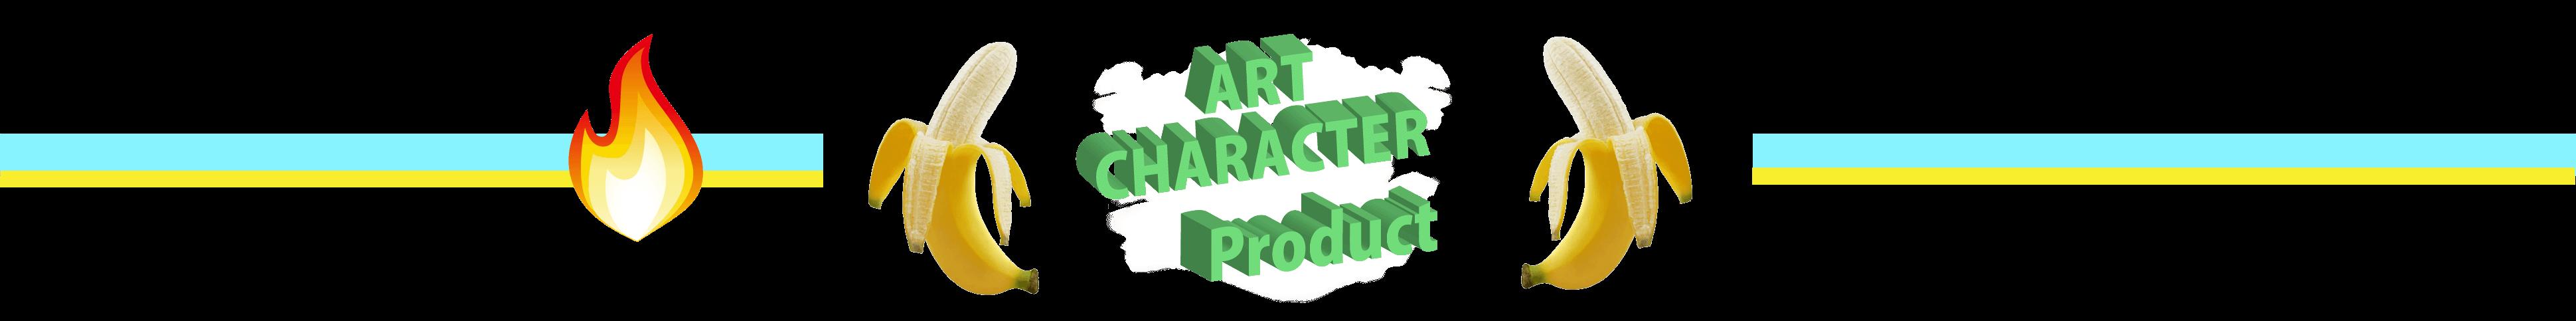 art_character_product_header_class